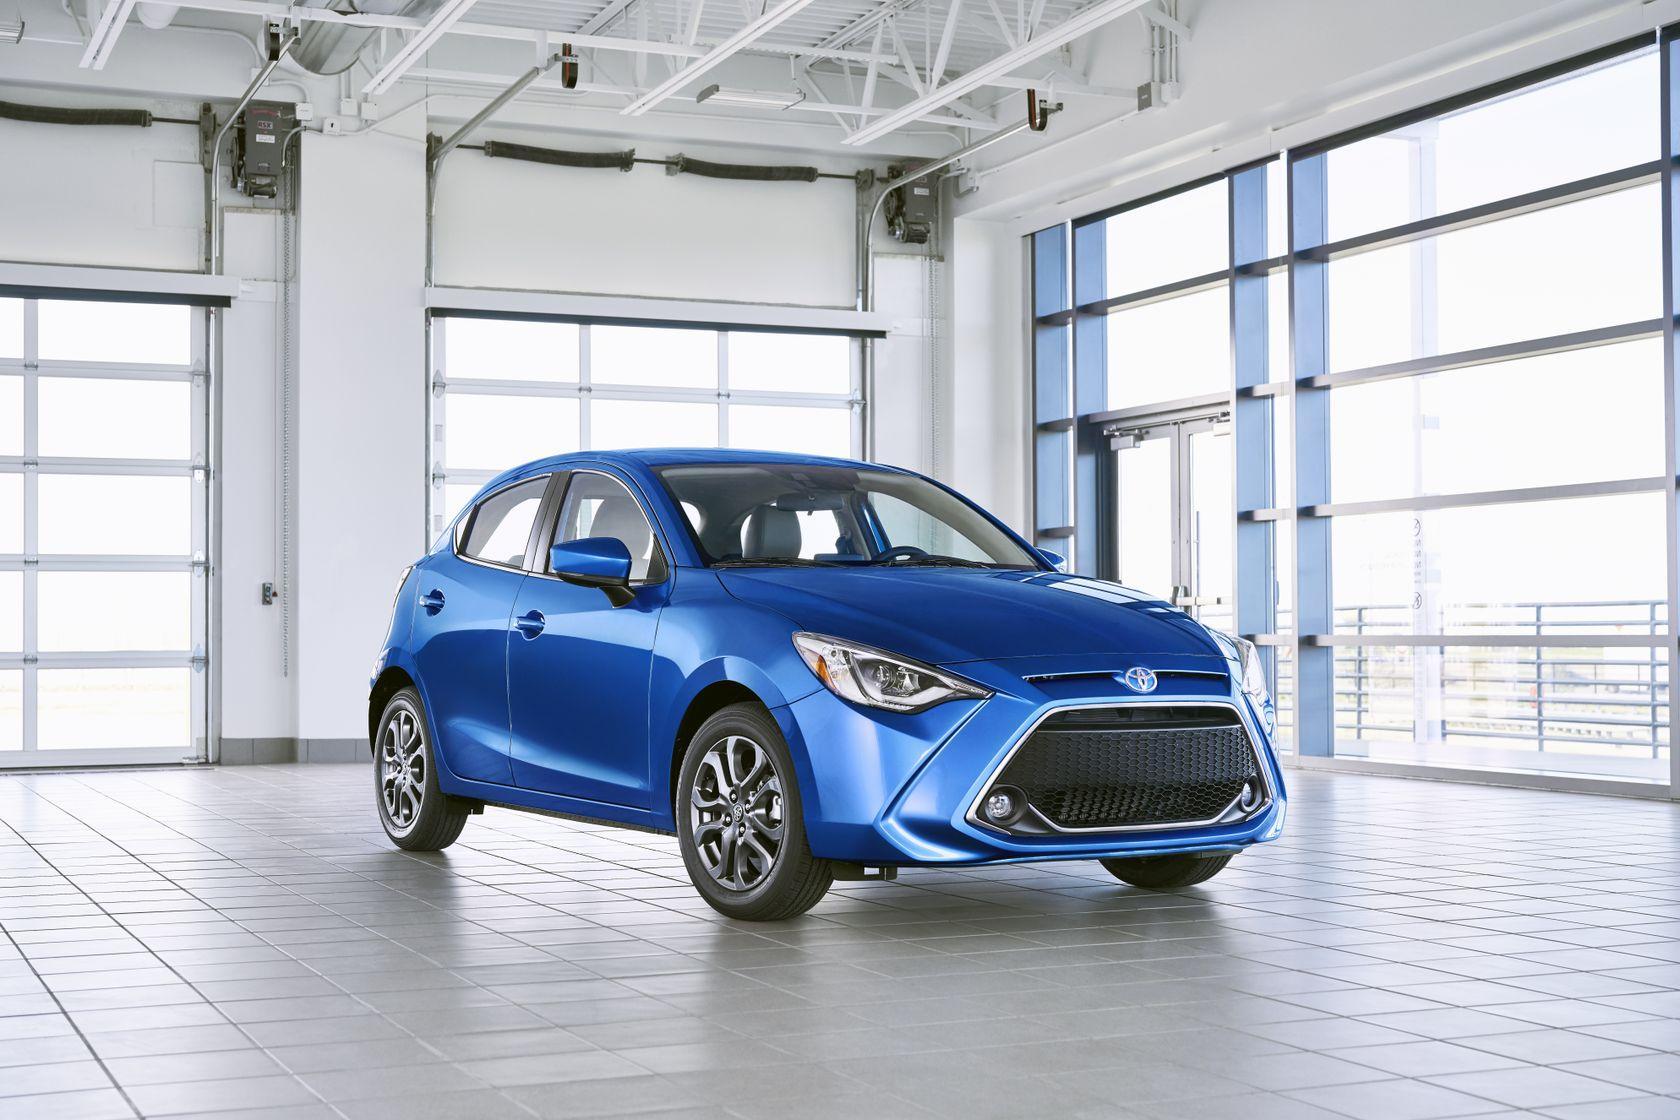 Toyota Yaris 2020 : Mazda 3 vous avez dit?